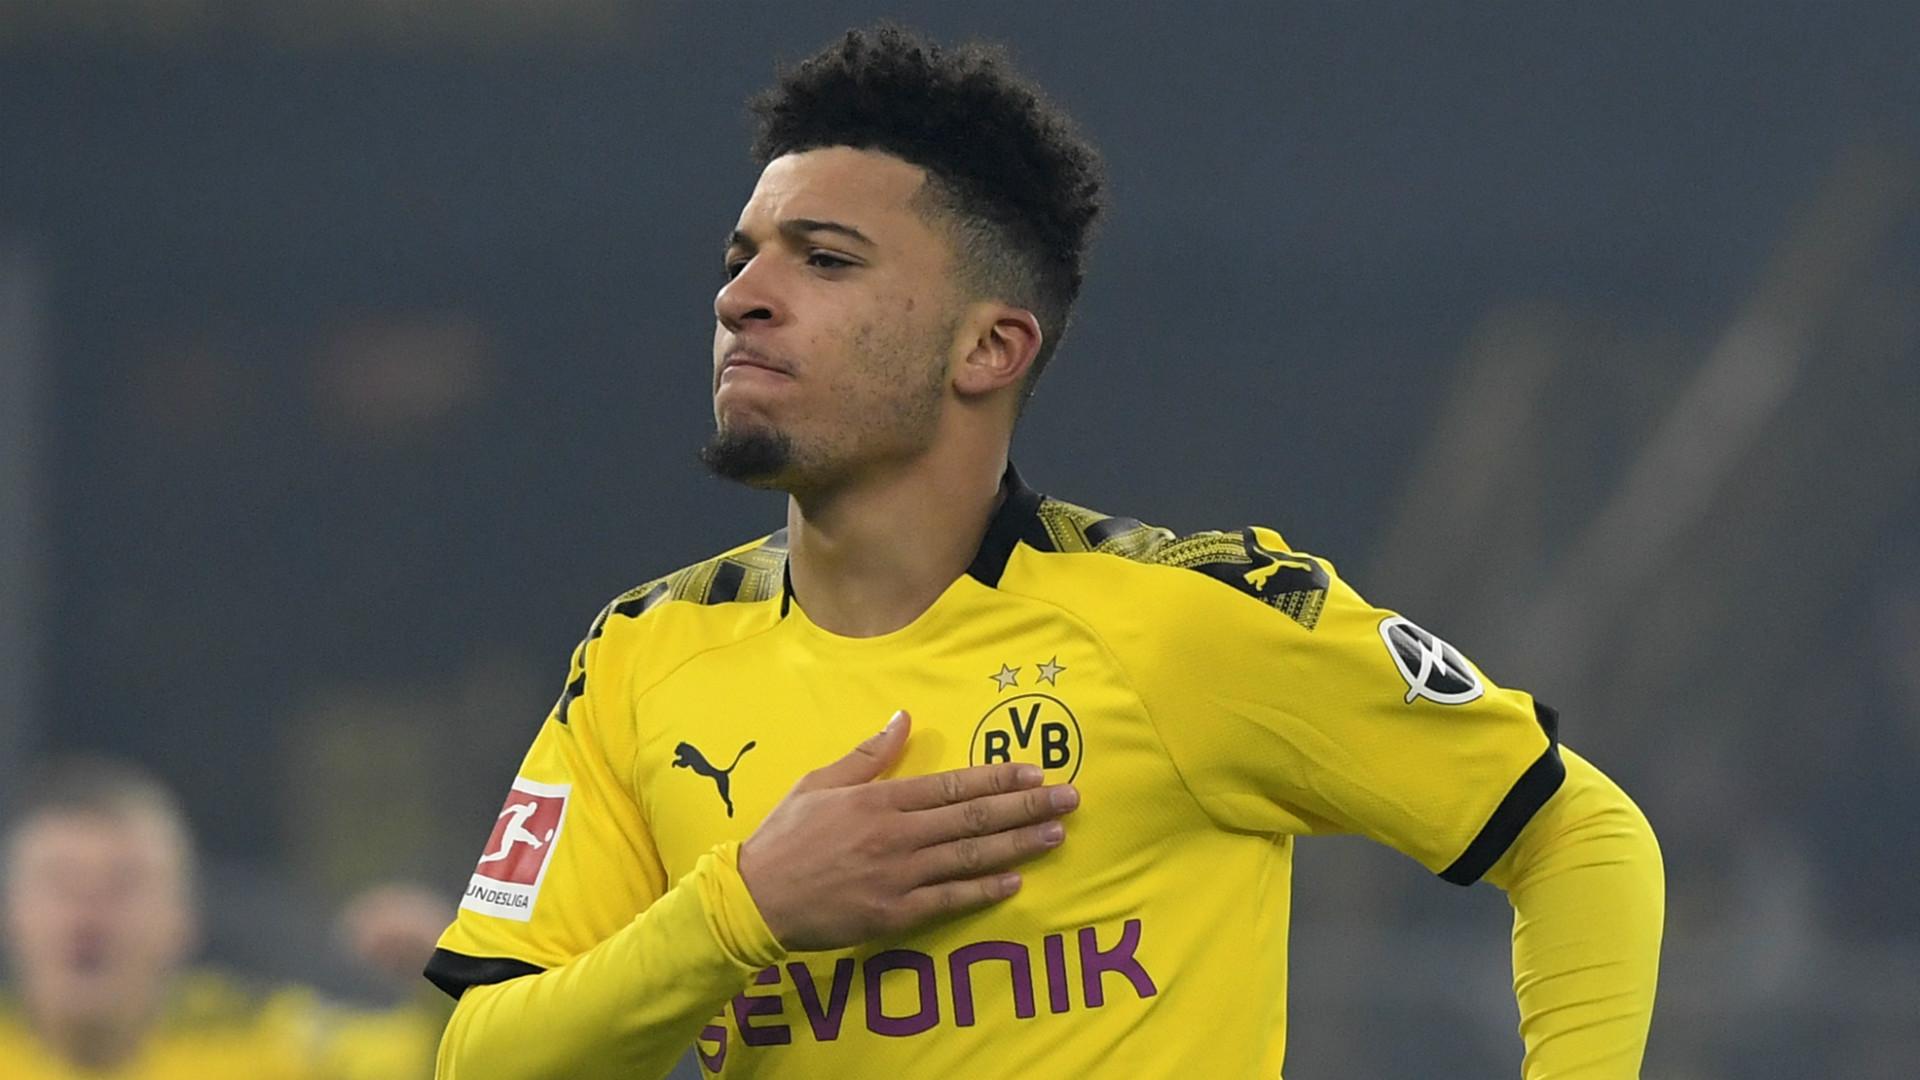 'Sancho can strengthen any team' - Kahn sparks talk of Bayern interest in Dortmund star